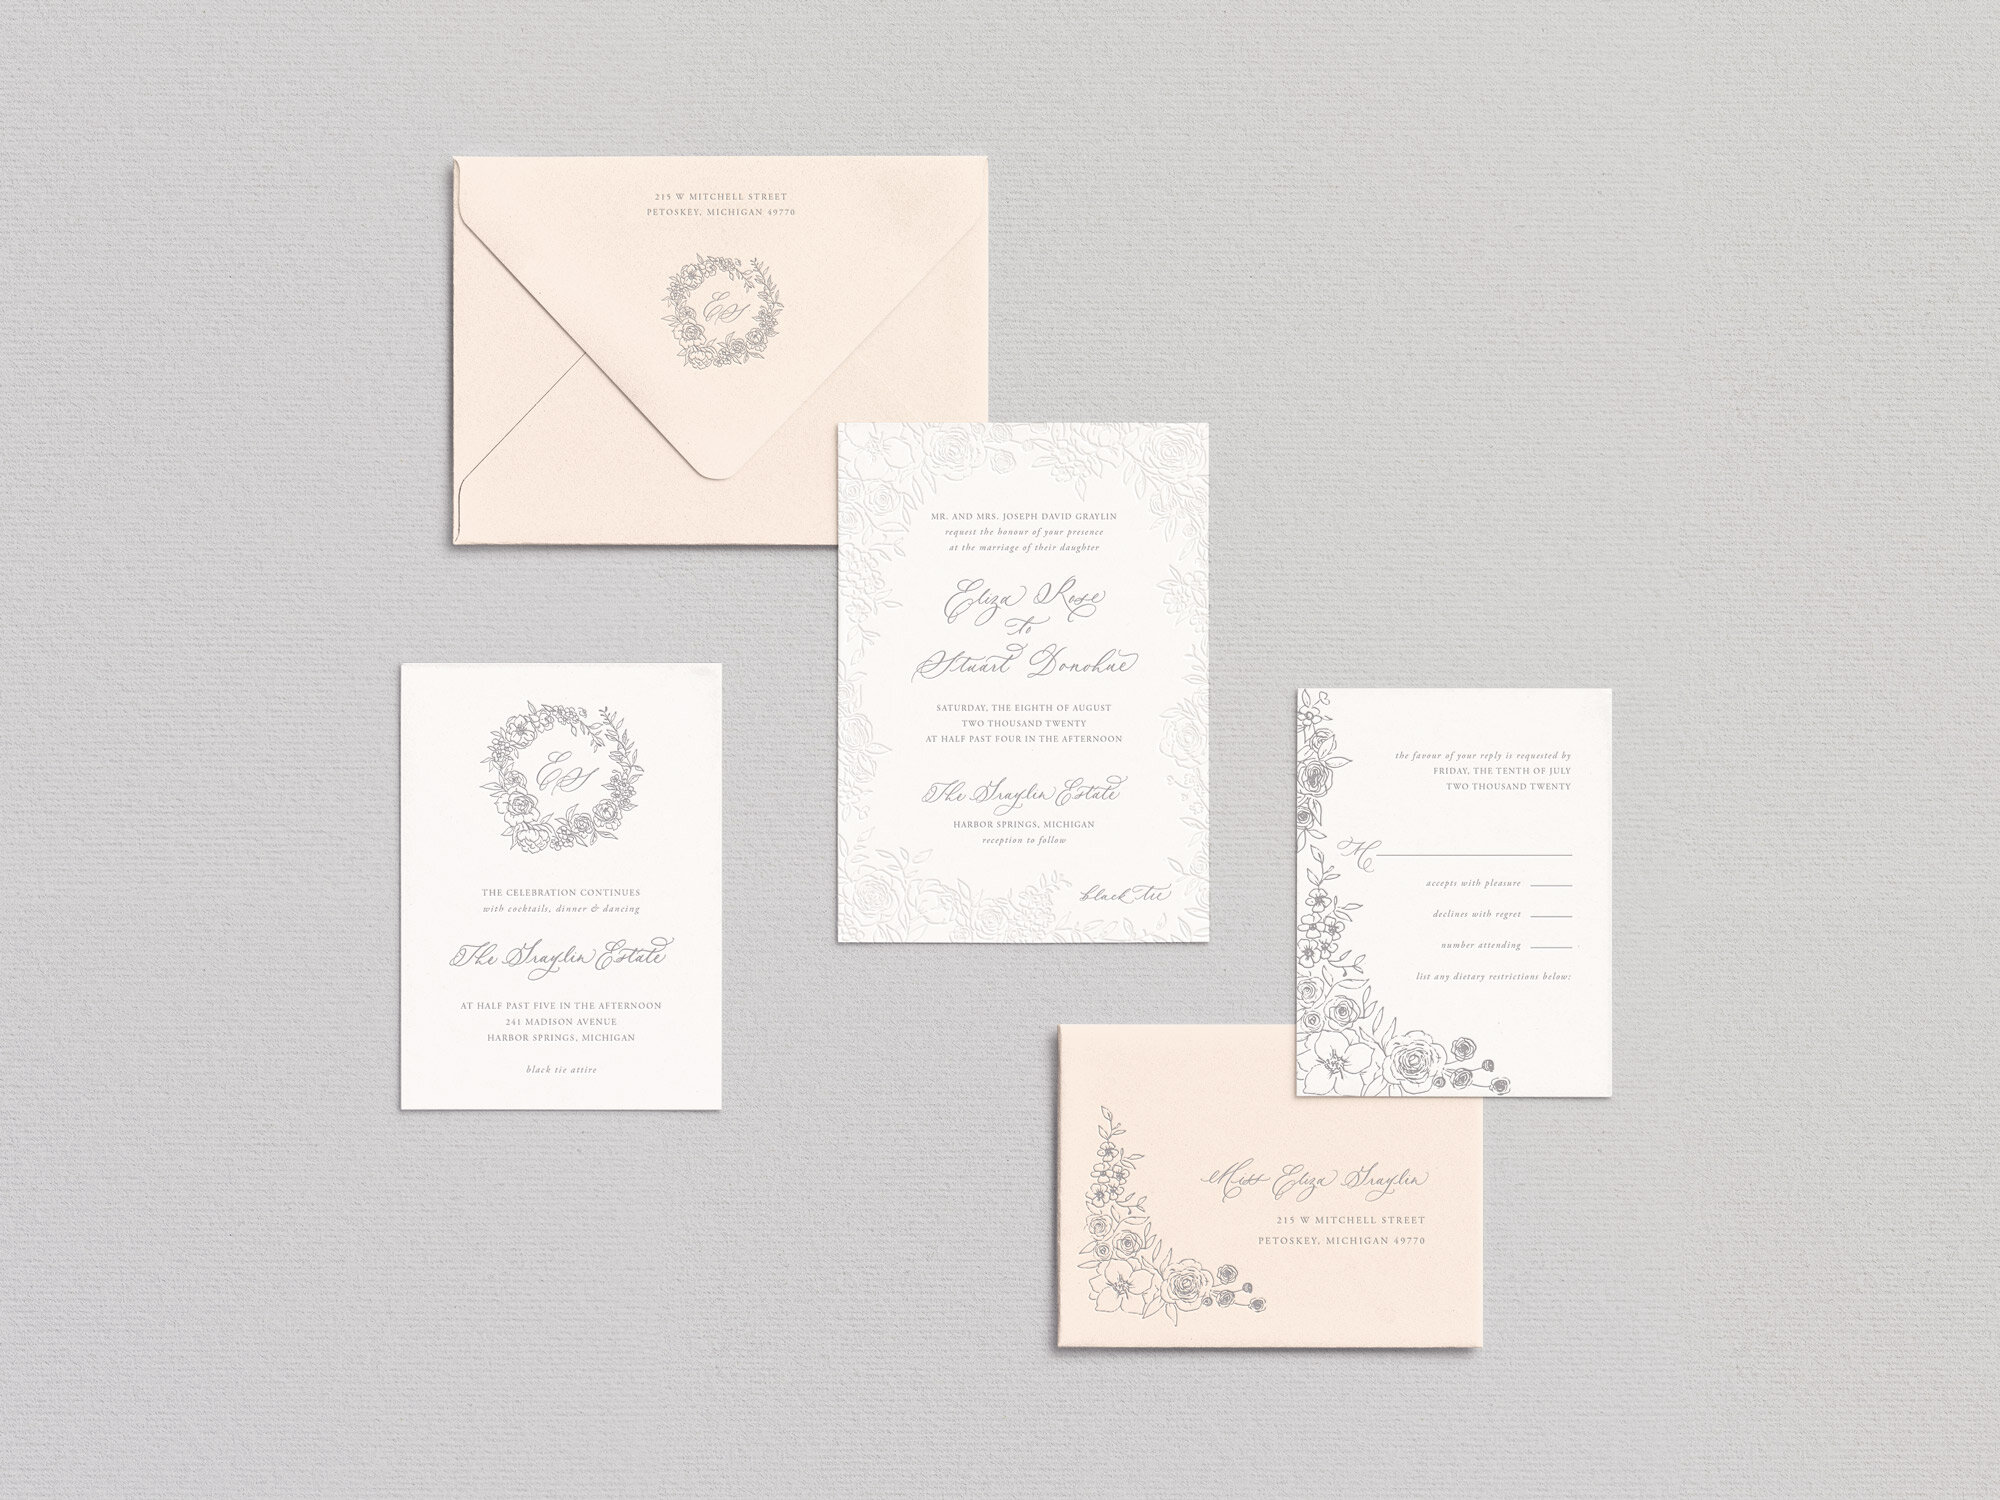 mockup_invitation_floral_2.jpg